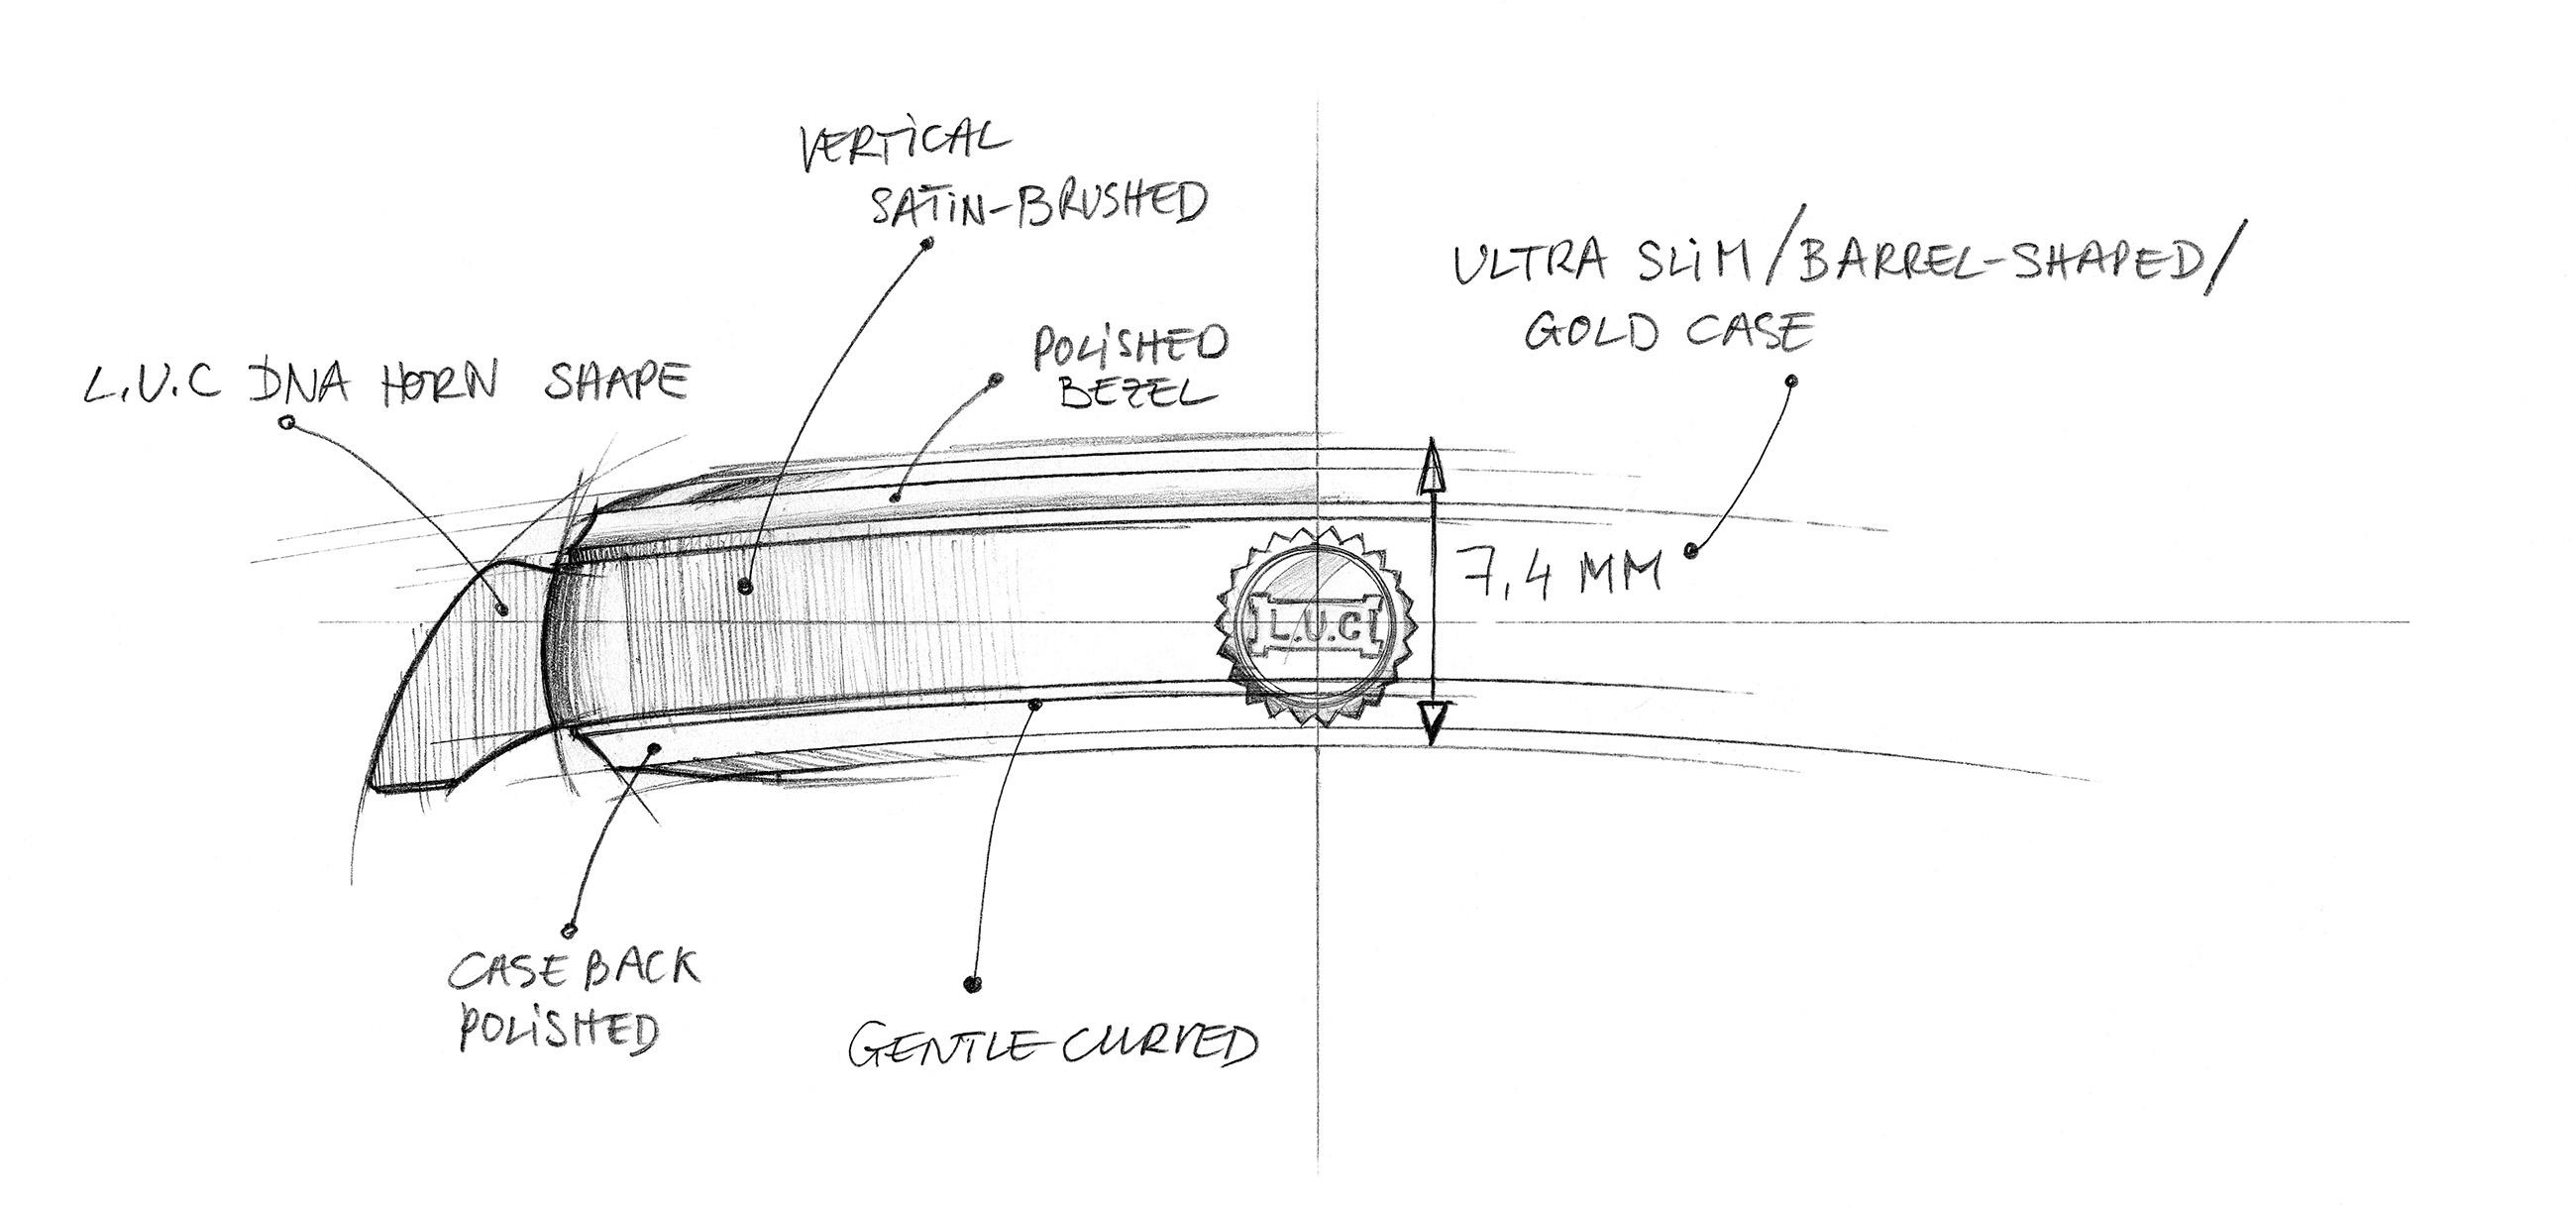 L.U.C Tonneau Heritage - Sketch 1 - Ultra slim case copy